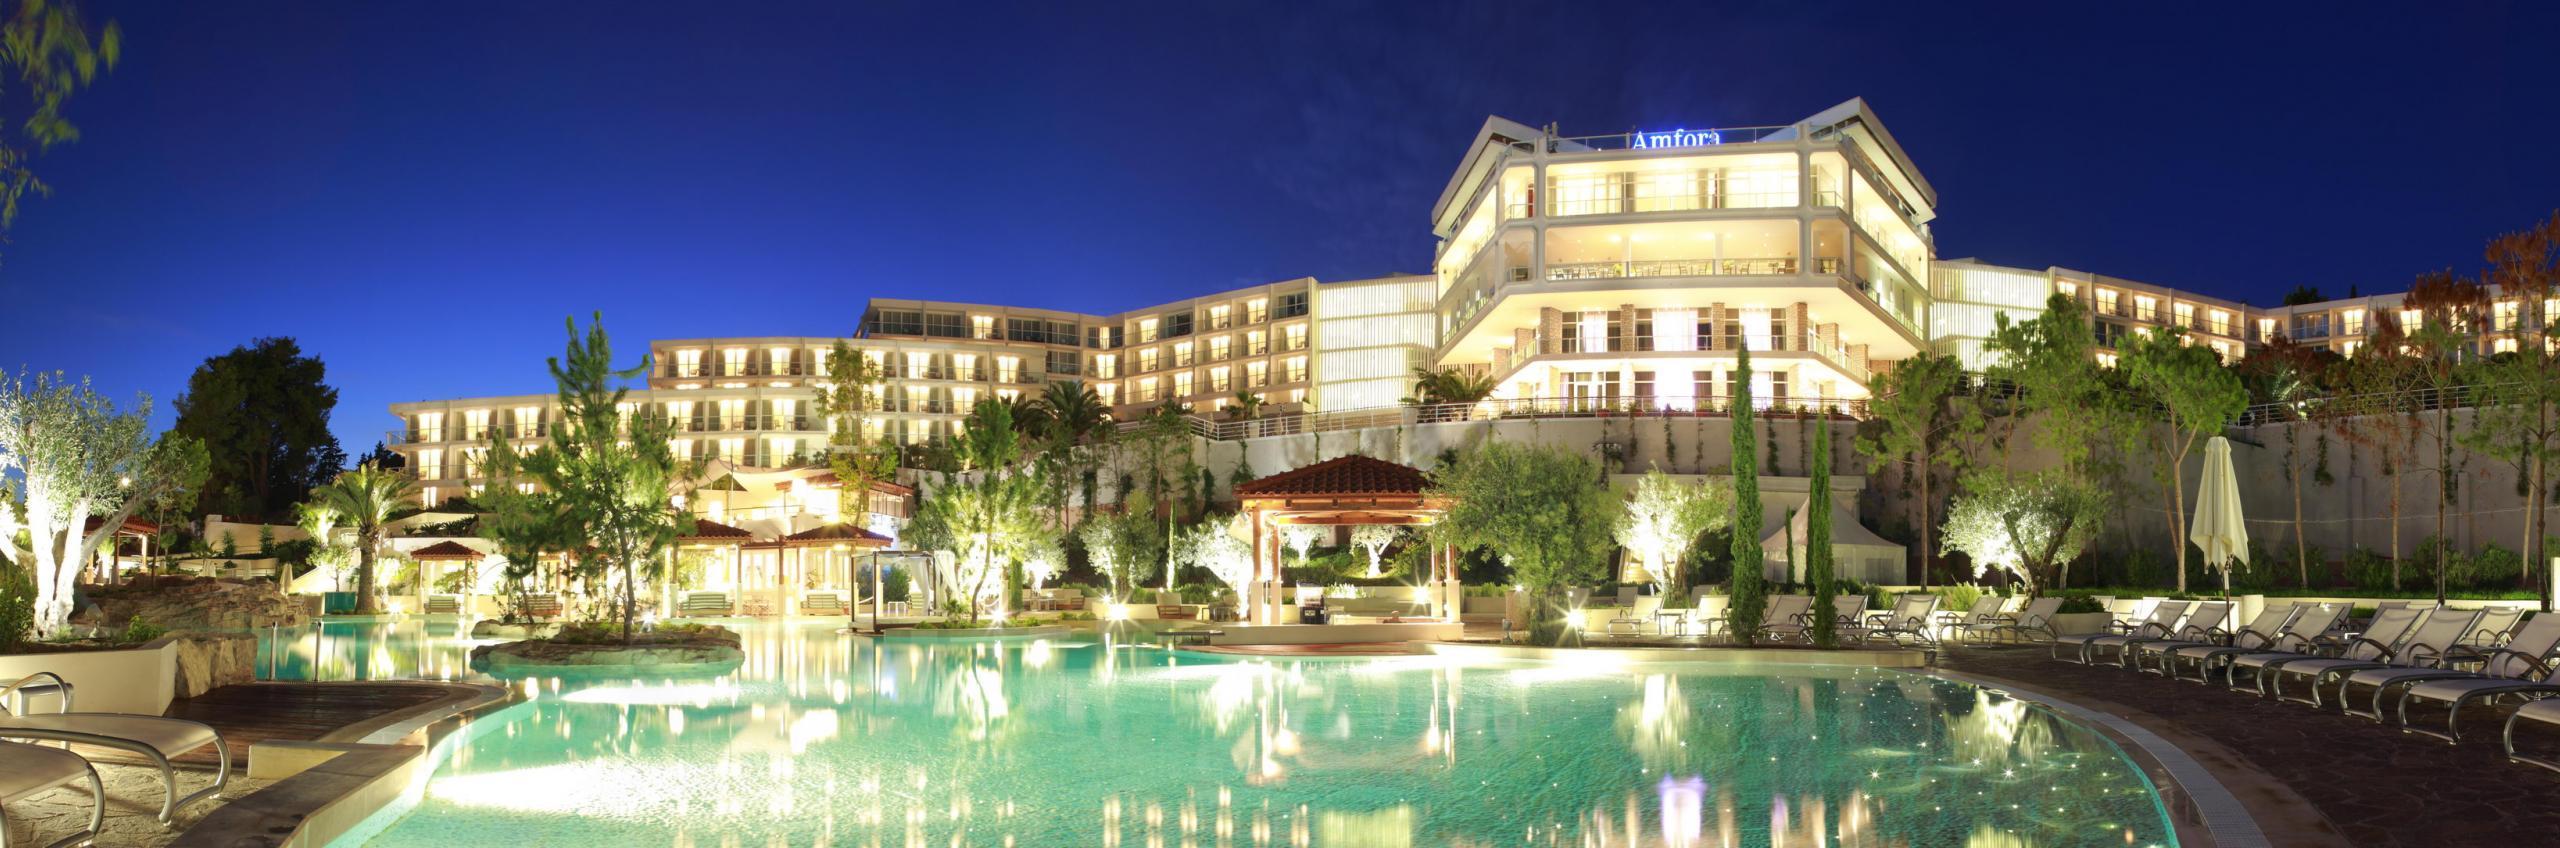 Amfora, hvar grand beach resort